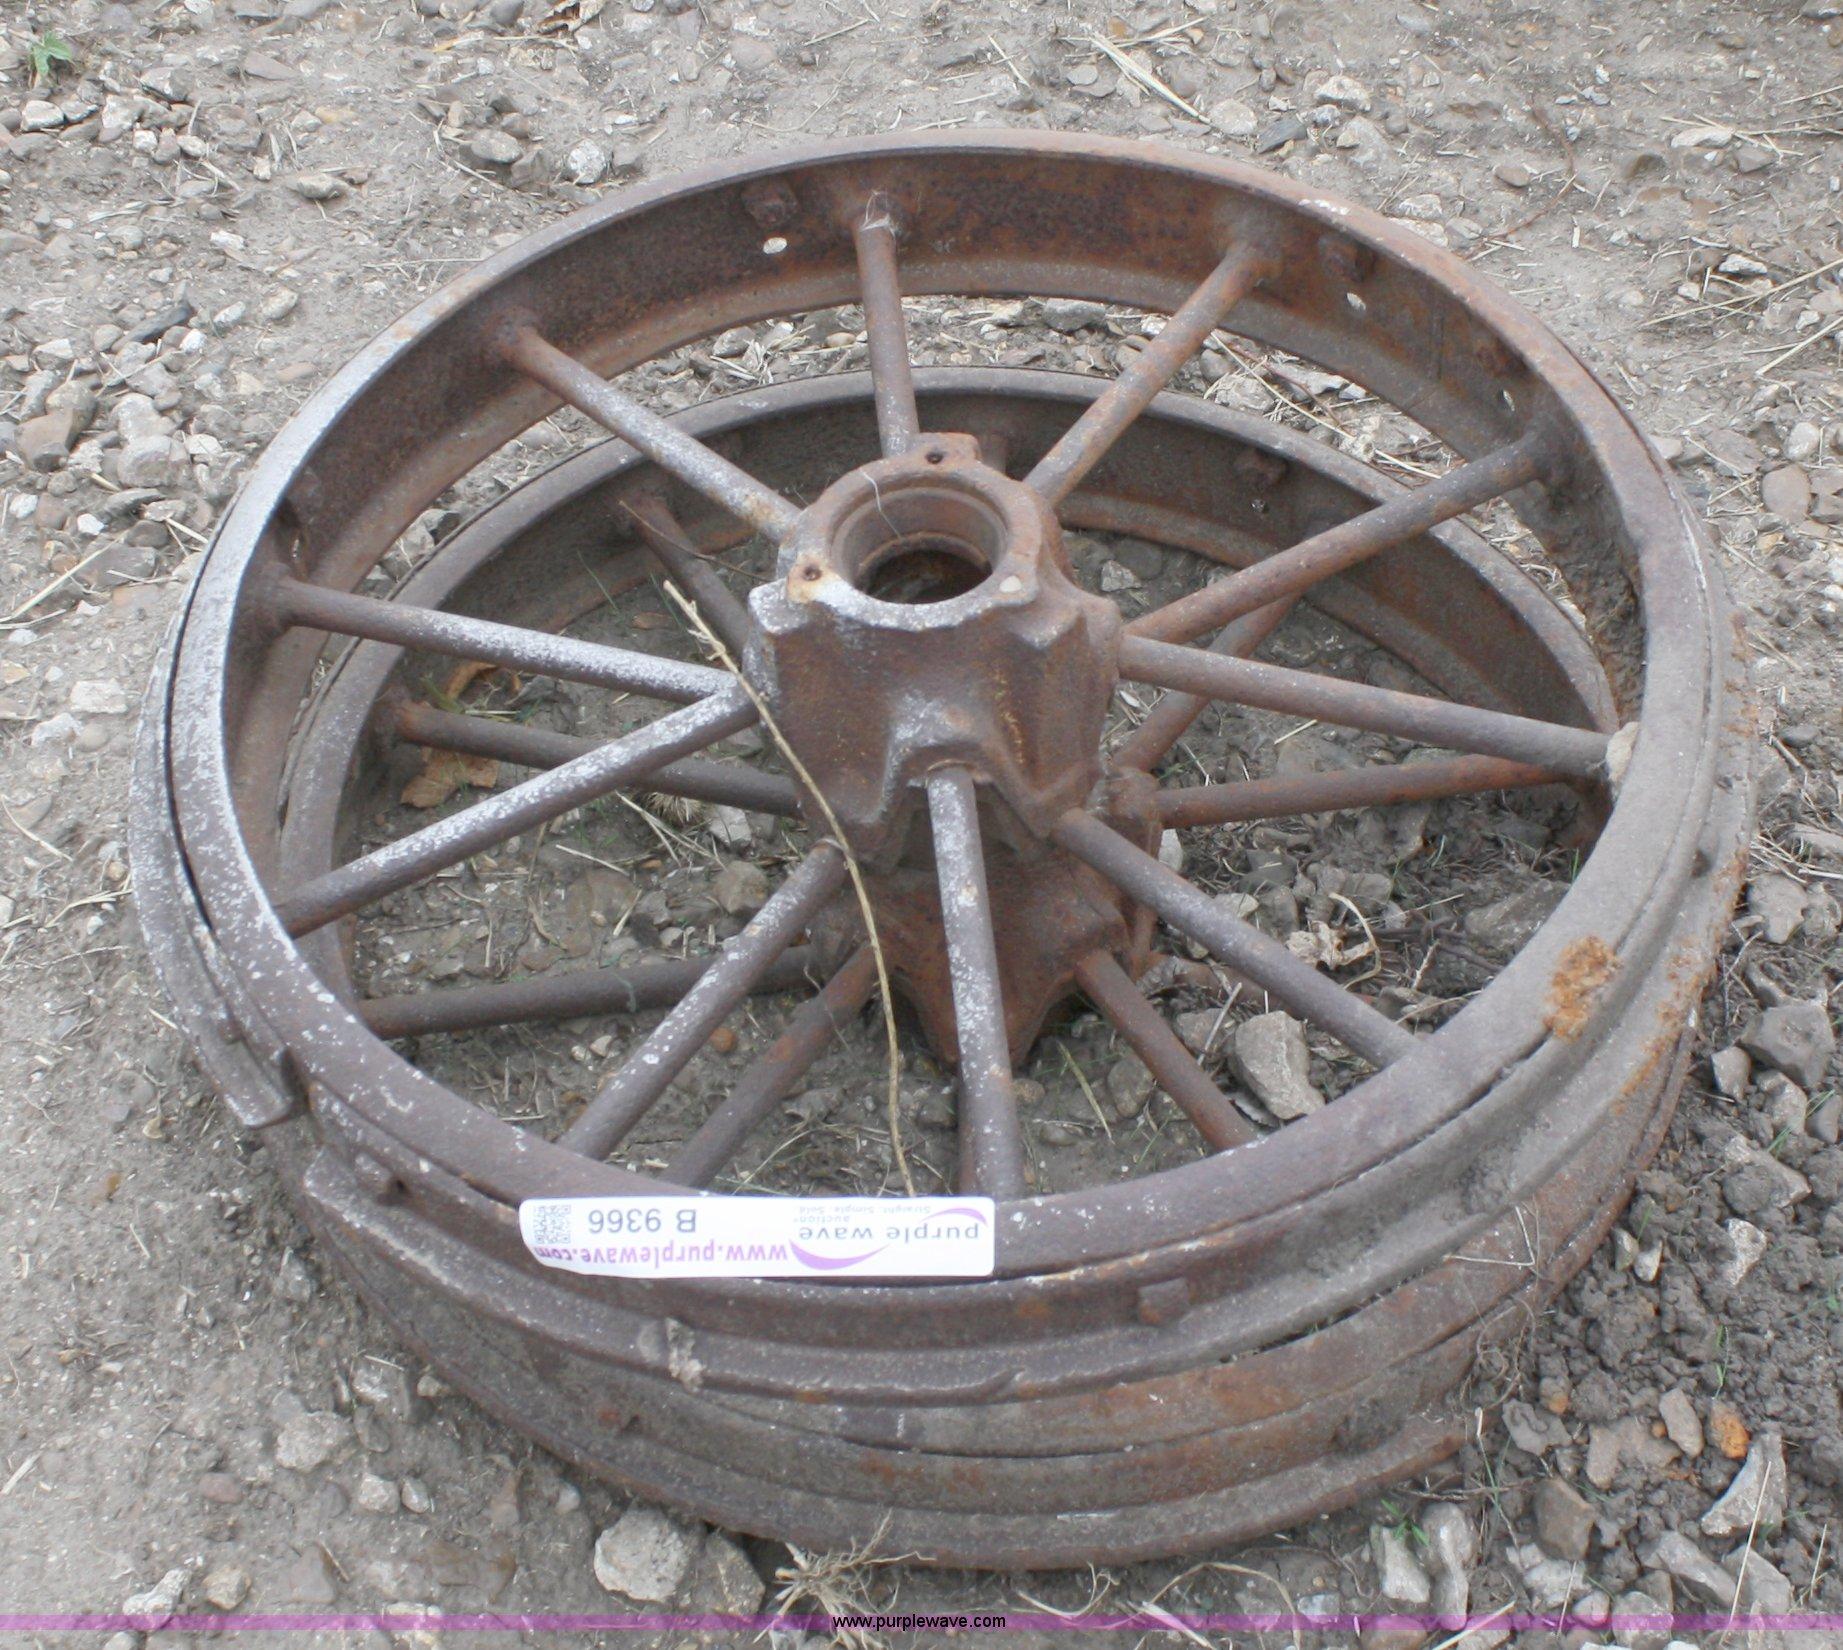 Deere Tractors On Steel Wheels : John deere model b front steel wheels item